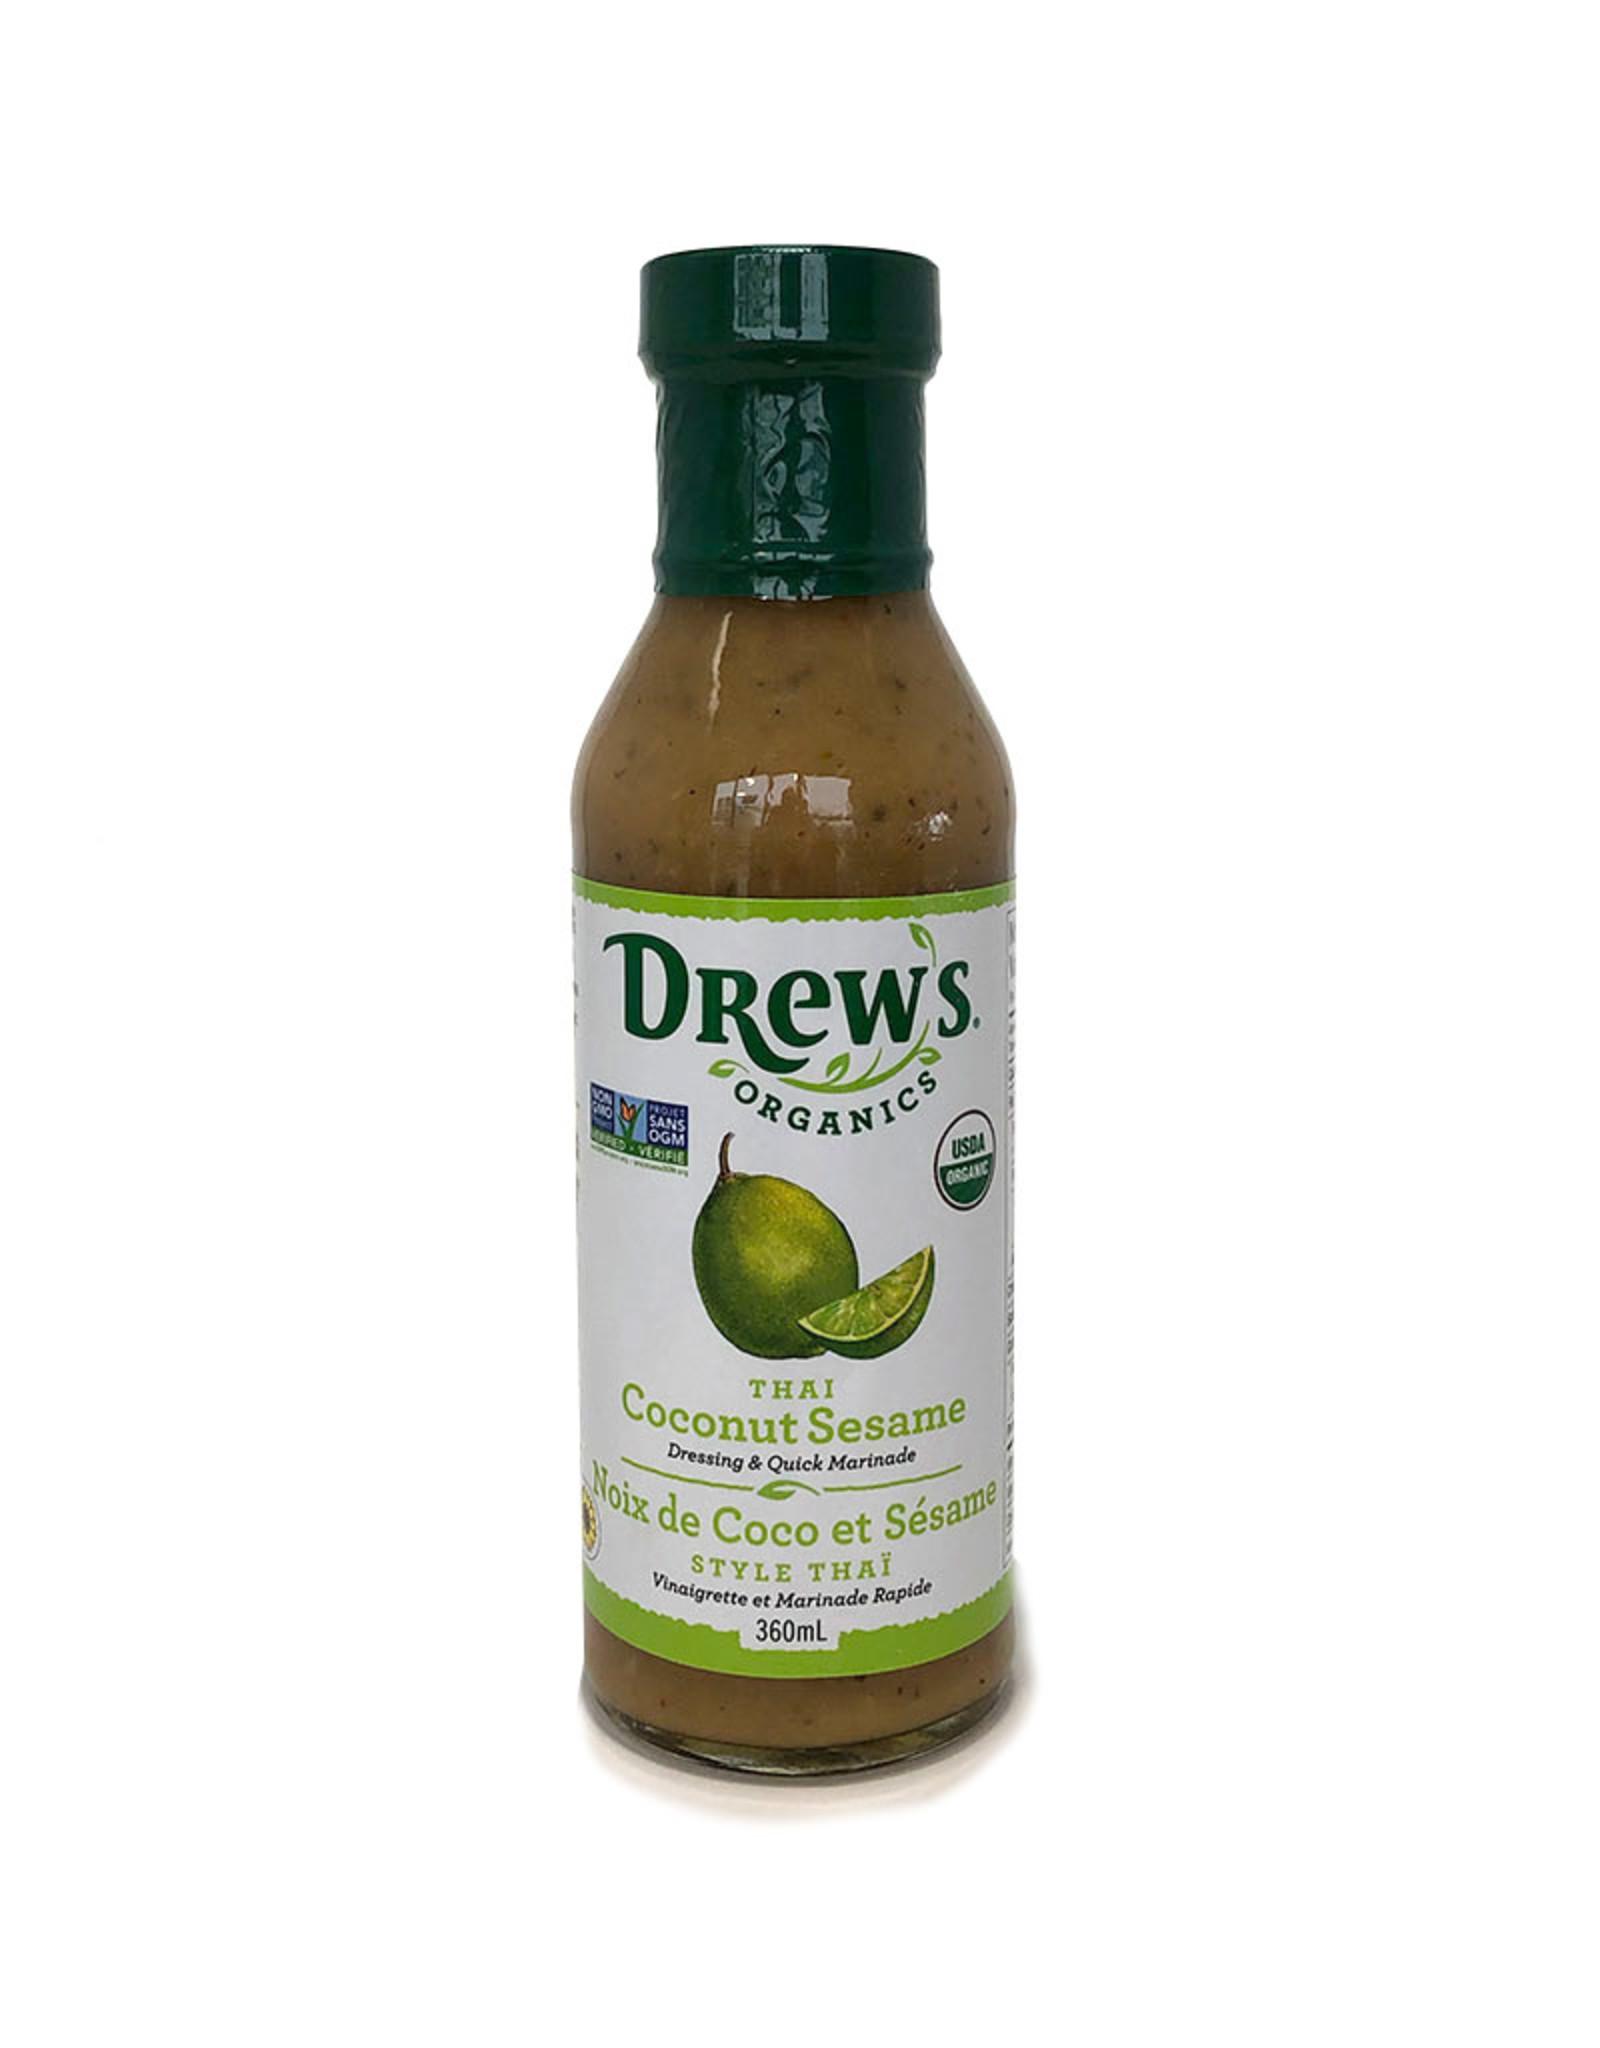 Drews Organics Drews - Organic Dressing, Thai Coconut Sesame (360ml)